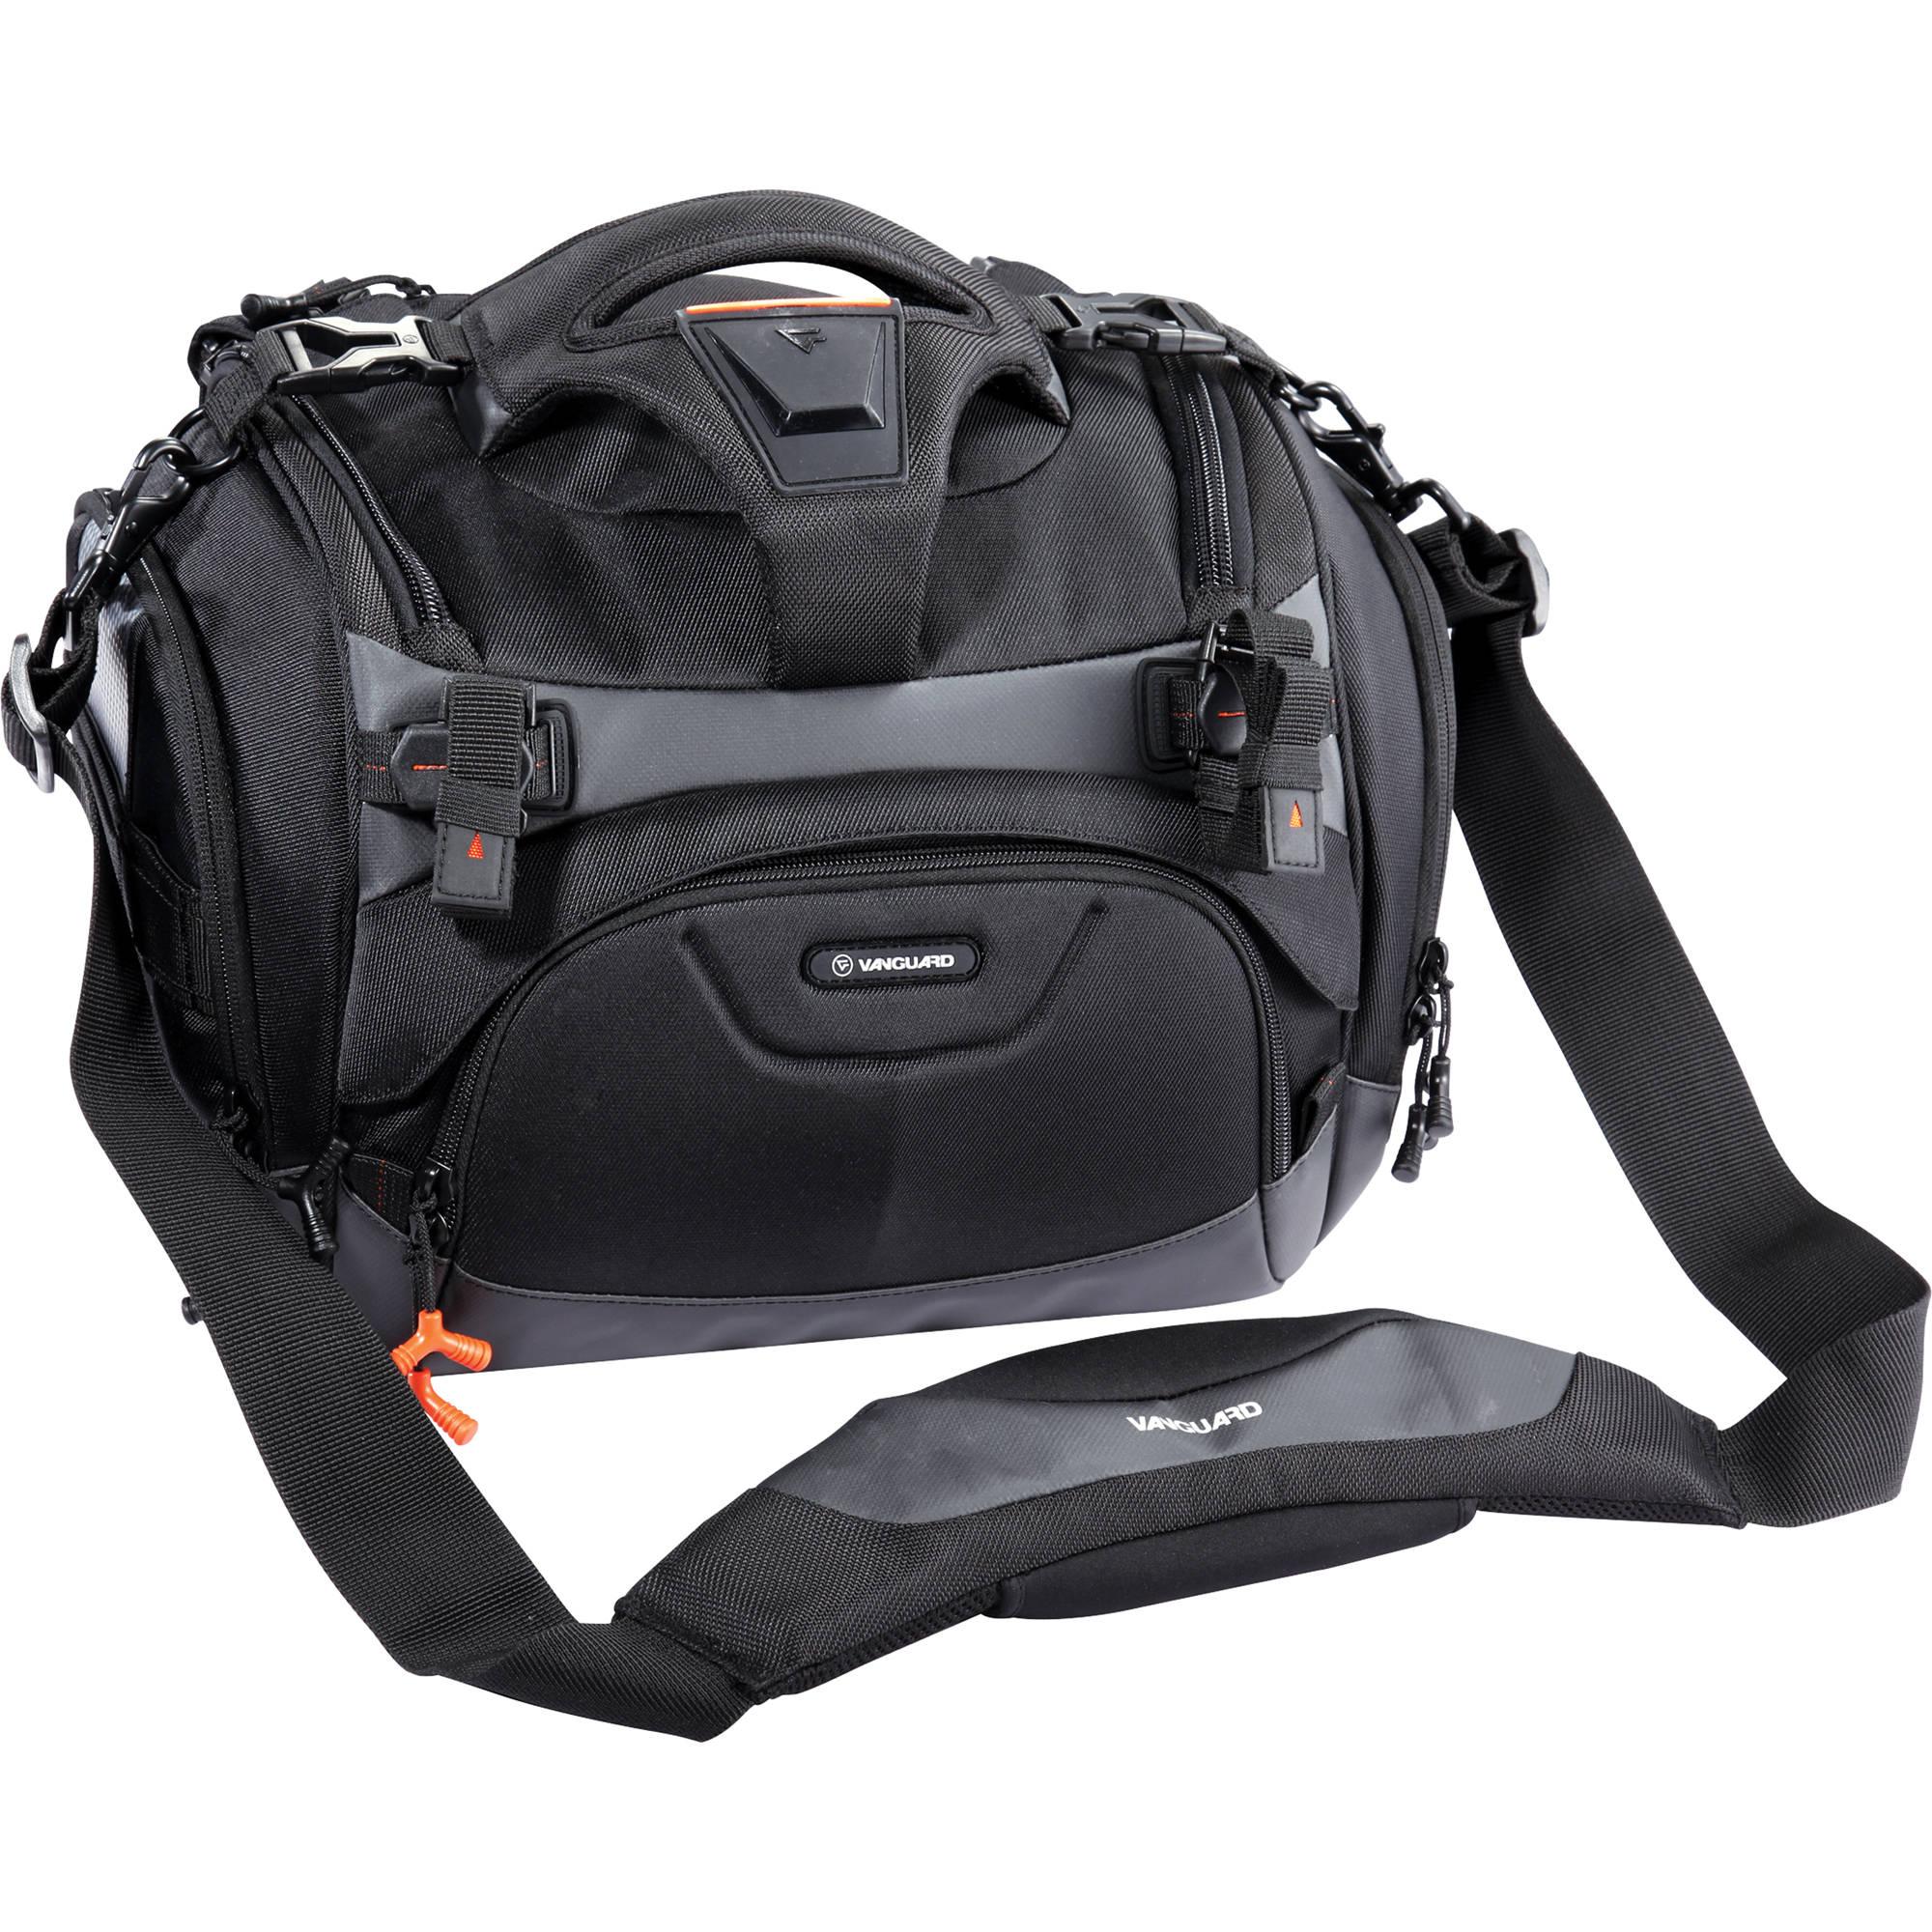 Vanguard Xcenior Series Shoulder Bag 93